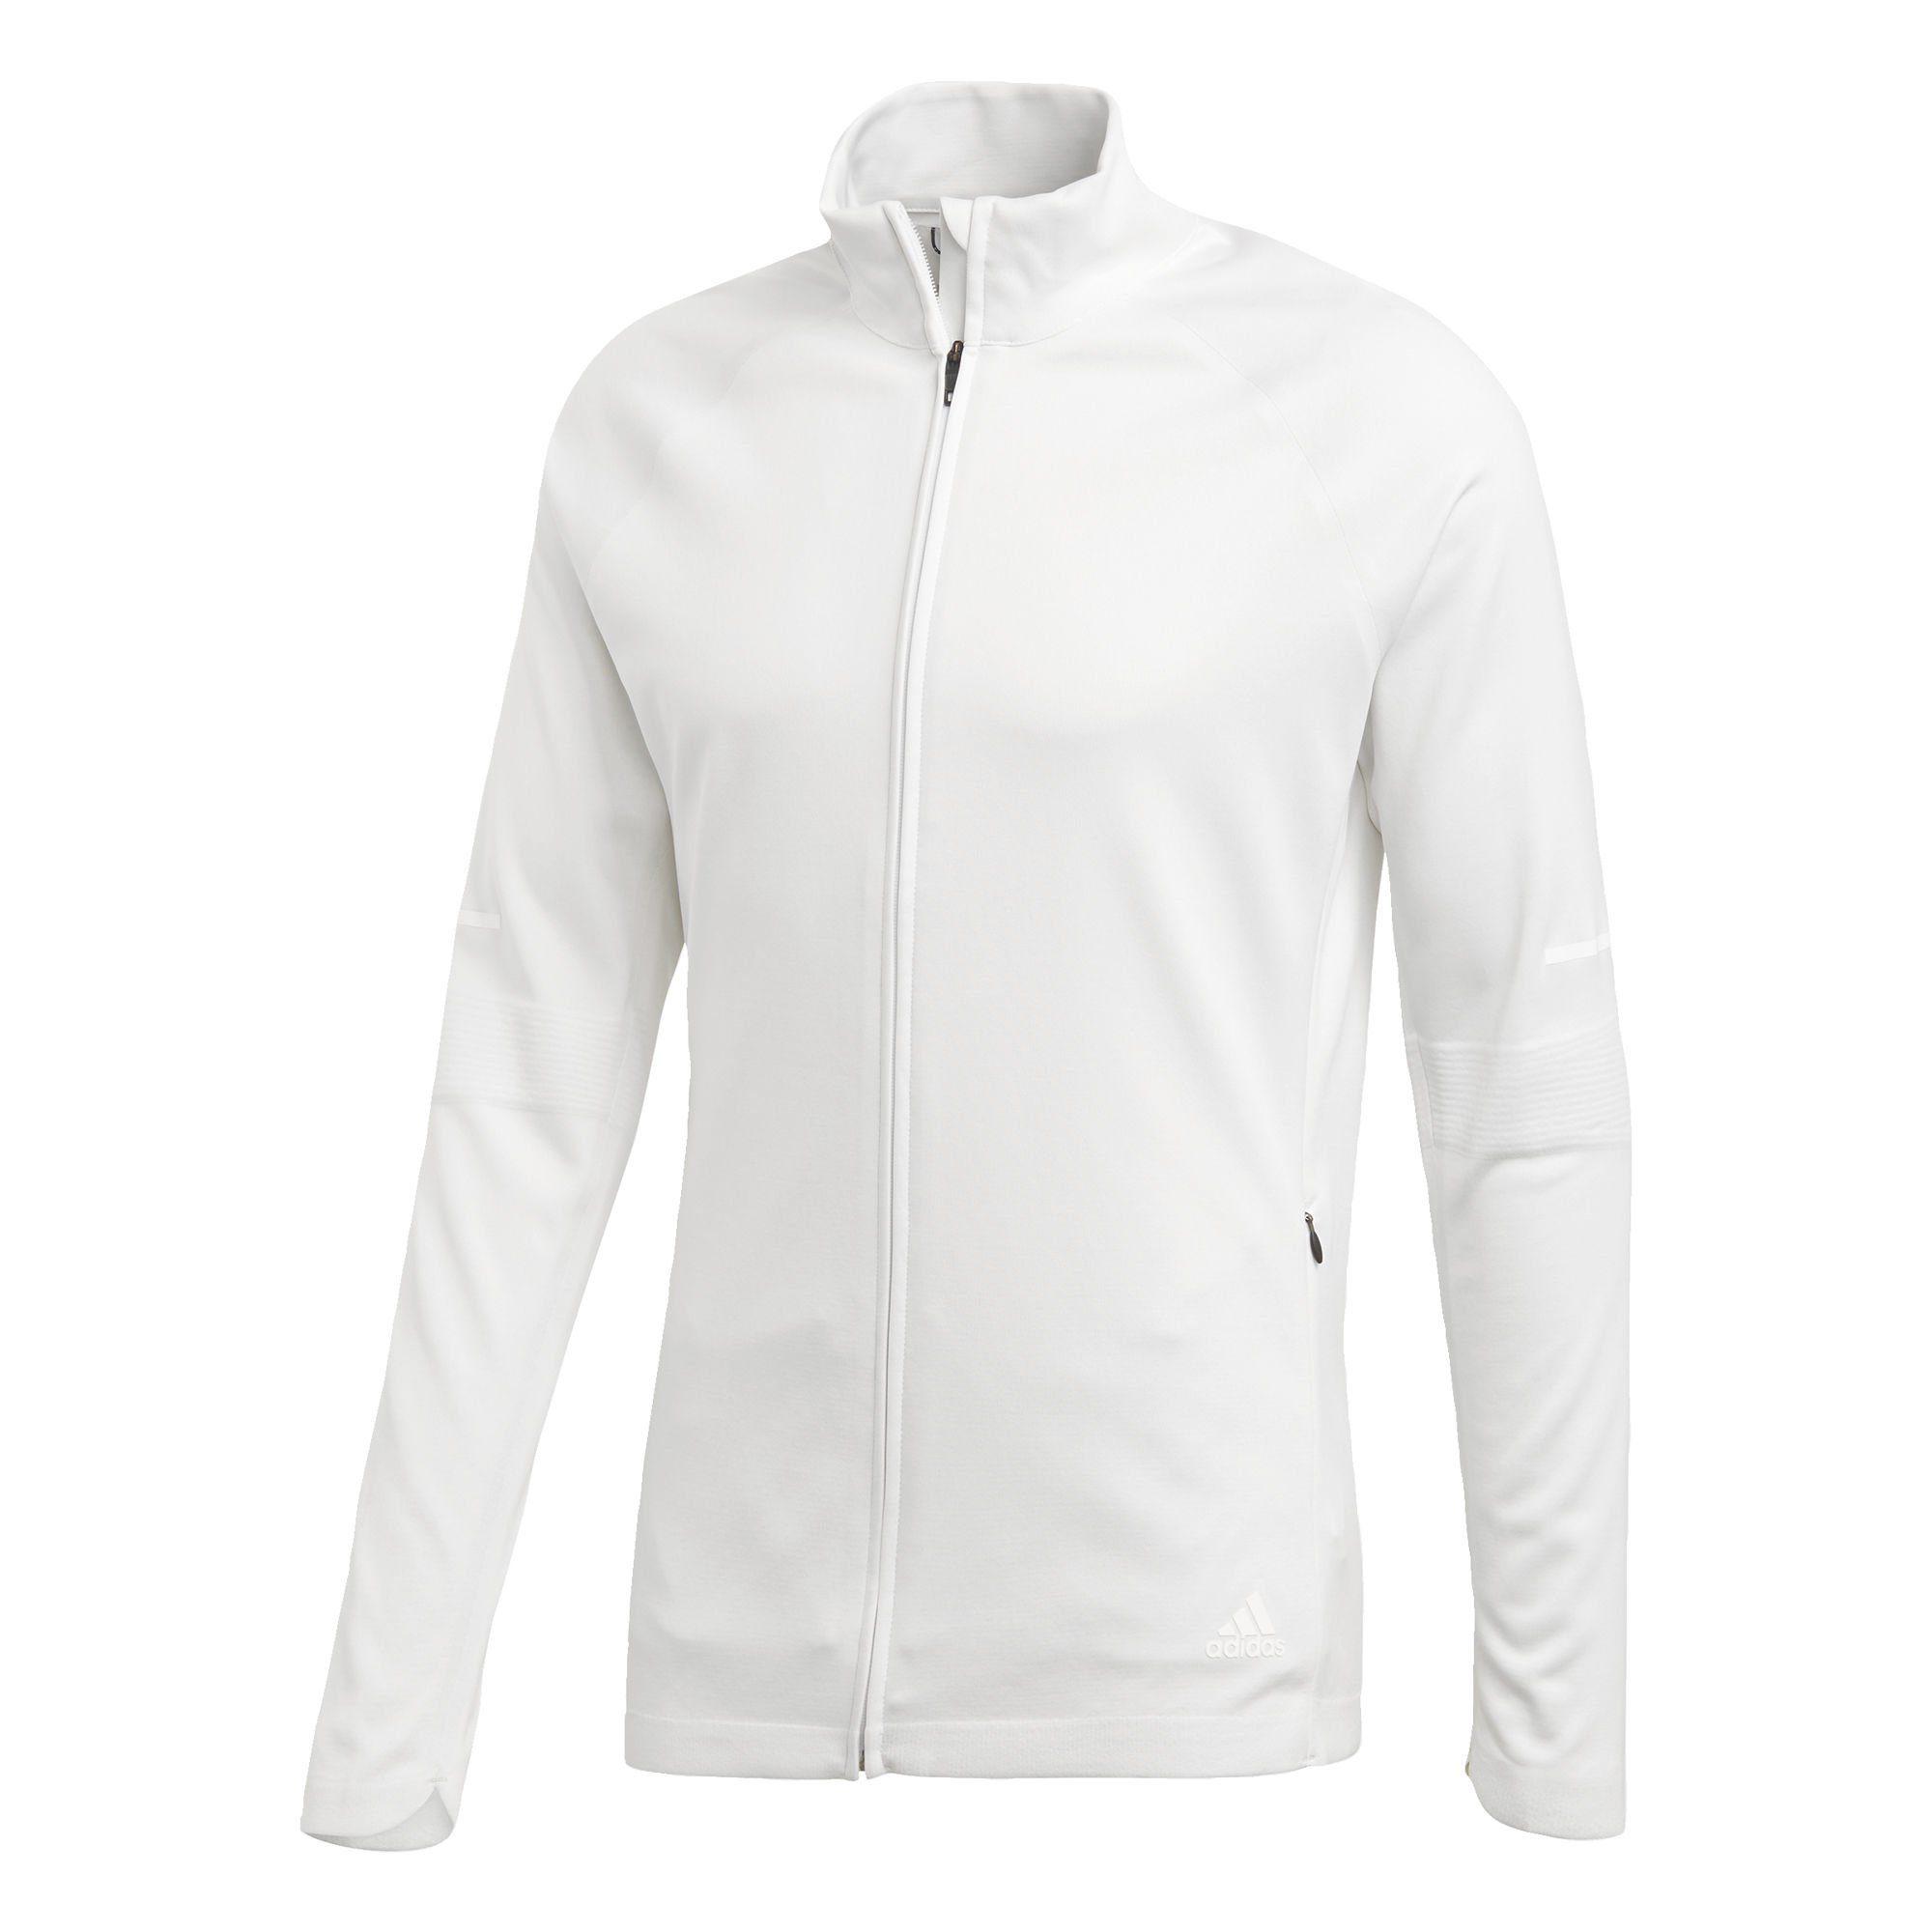 adidas Performance Fleecejacke »PHX Trainingsjacke« PureBoost online kaufen | OTTO